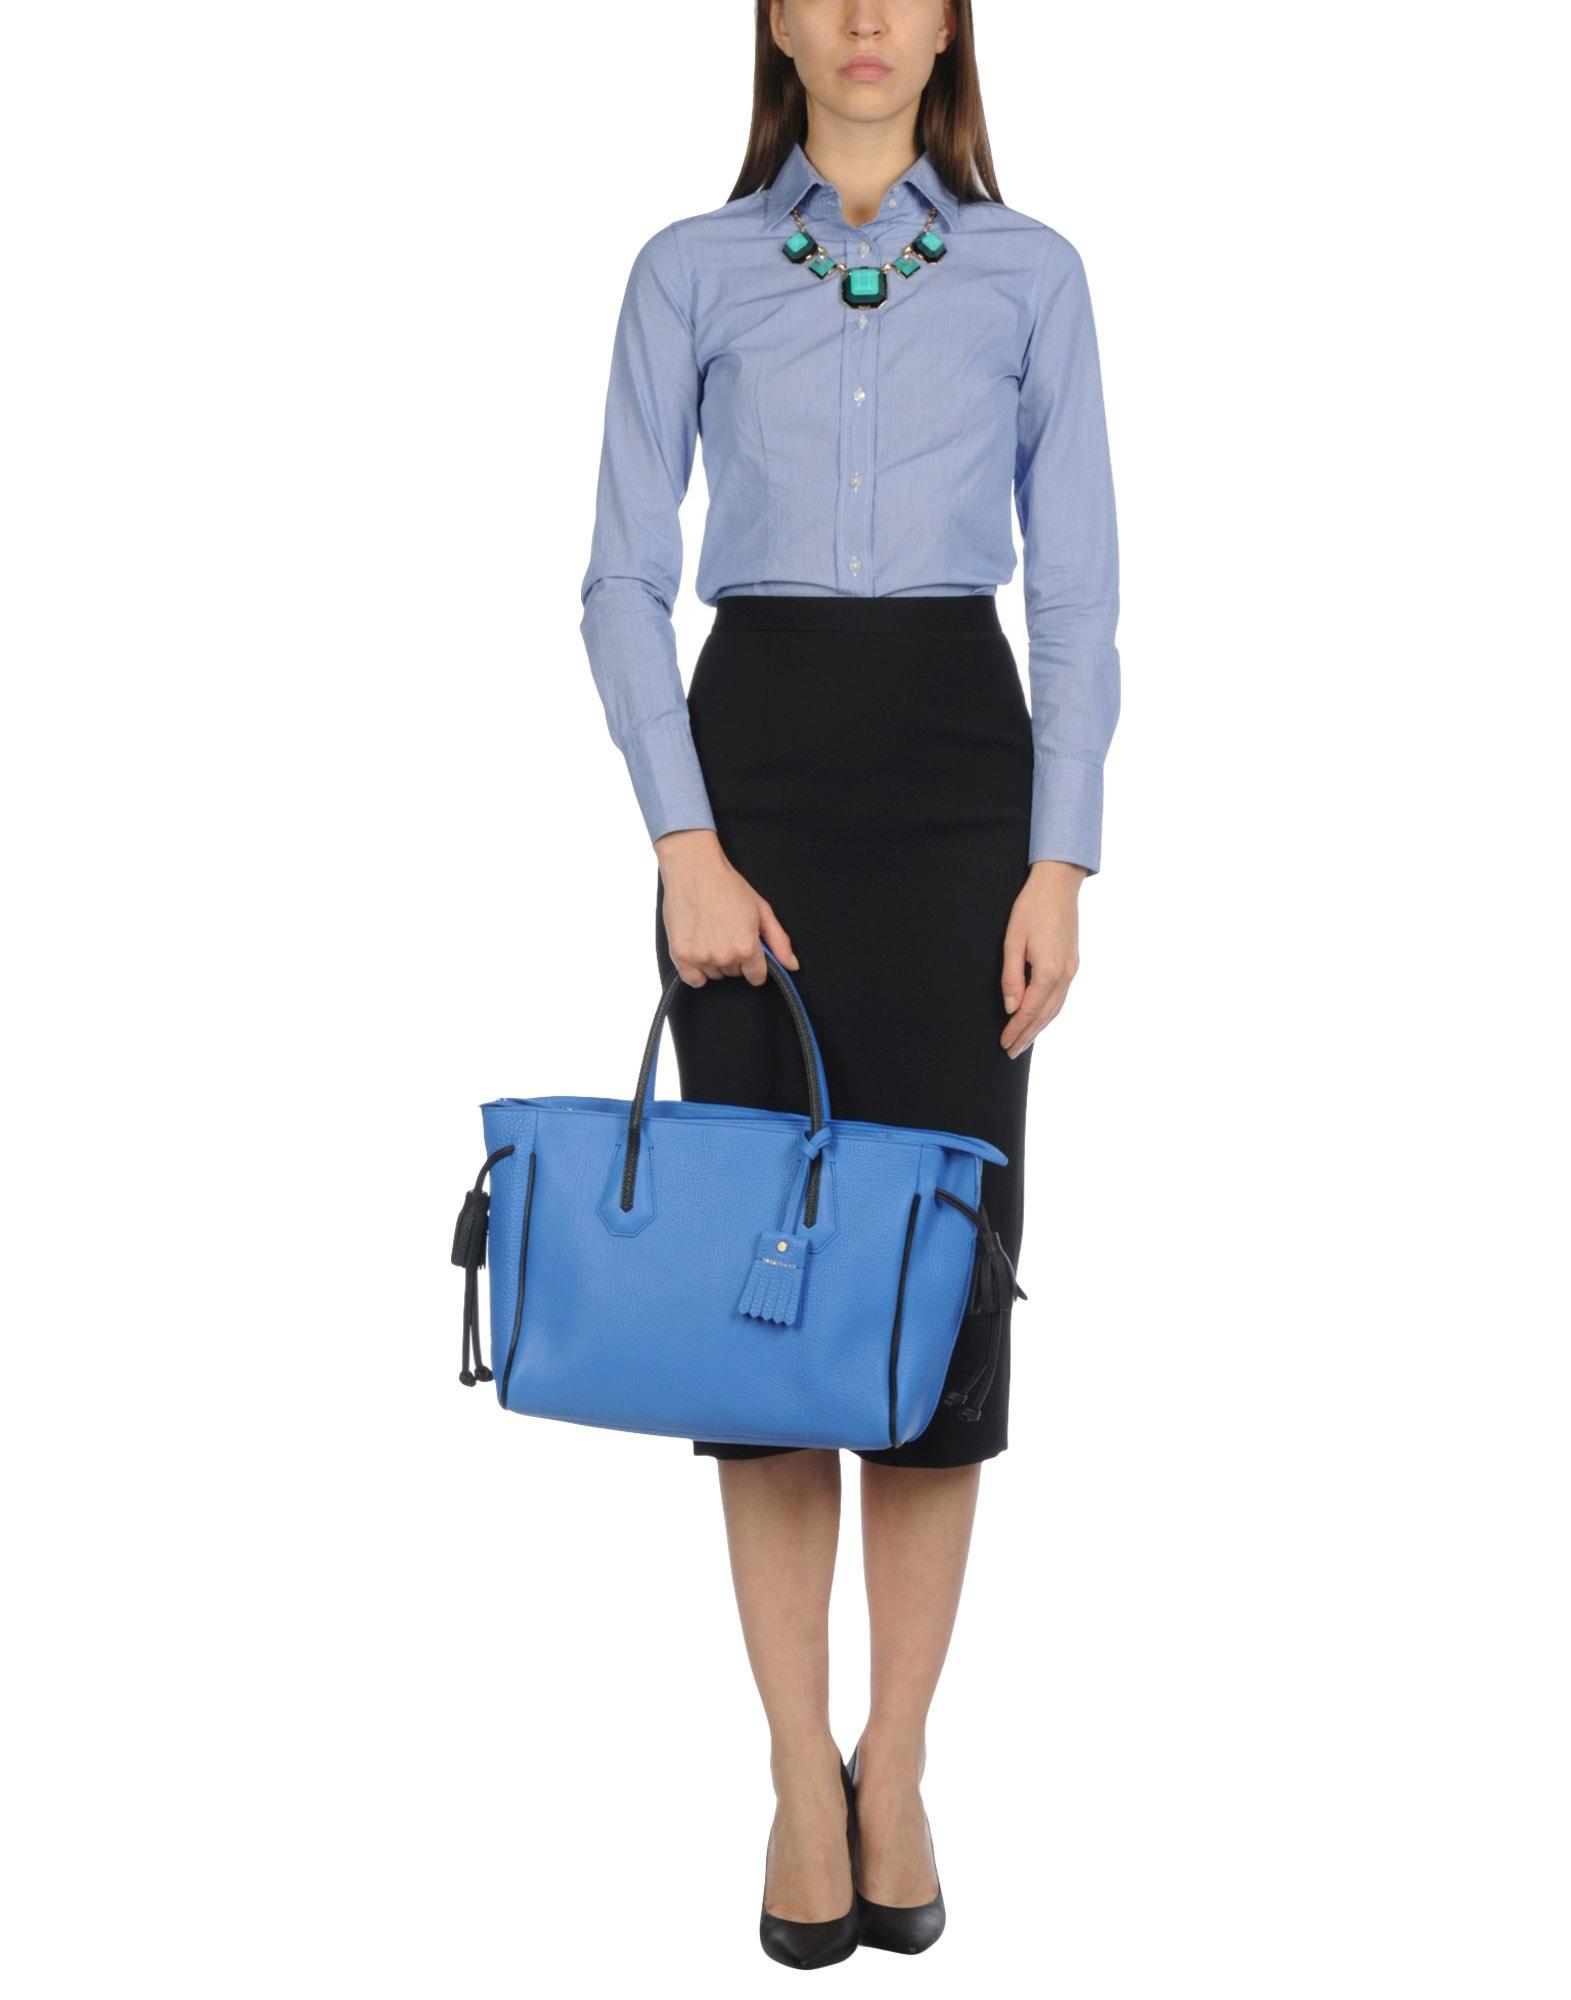 e5072dc8a5fc Longchamp Womens Leather Handbag Doctors bag Medium Double handle